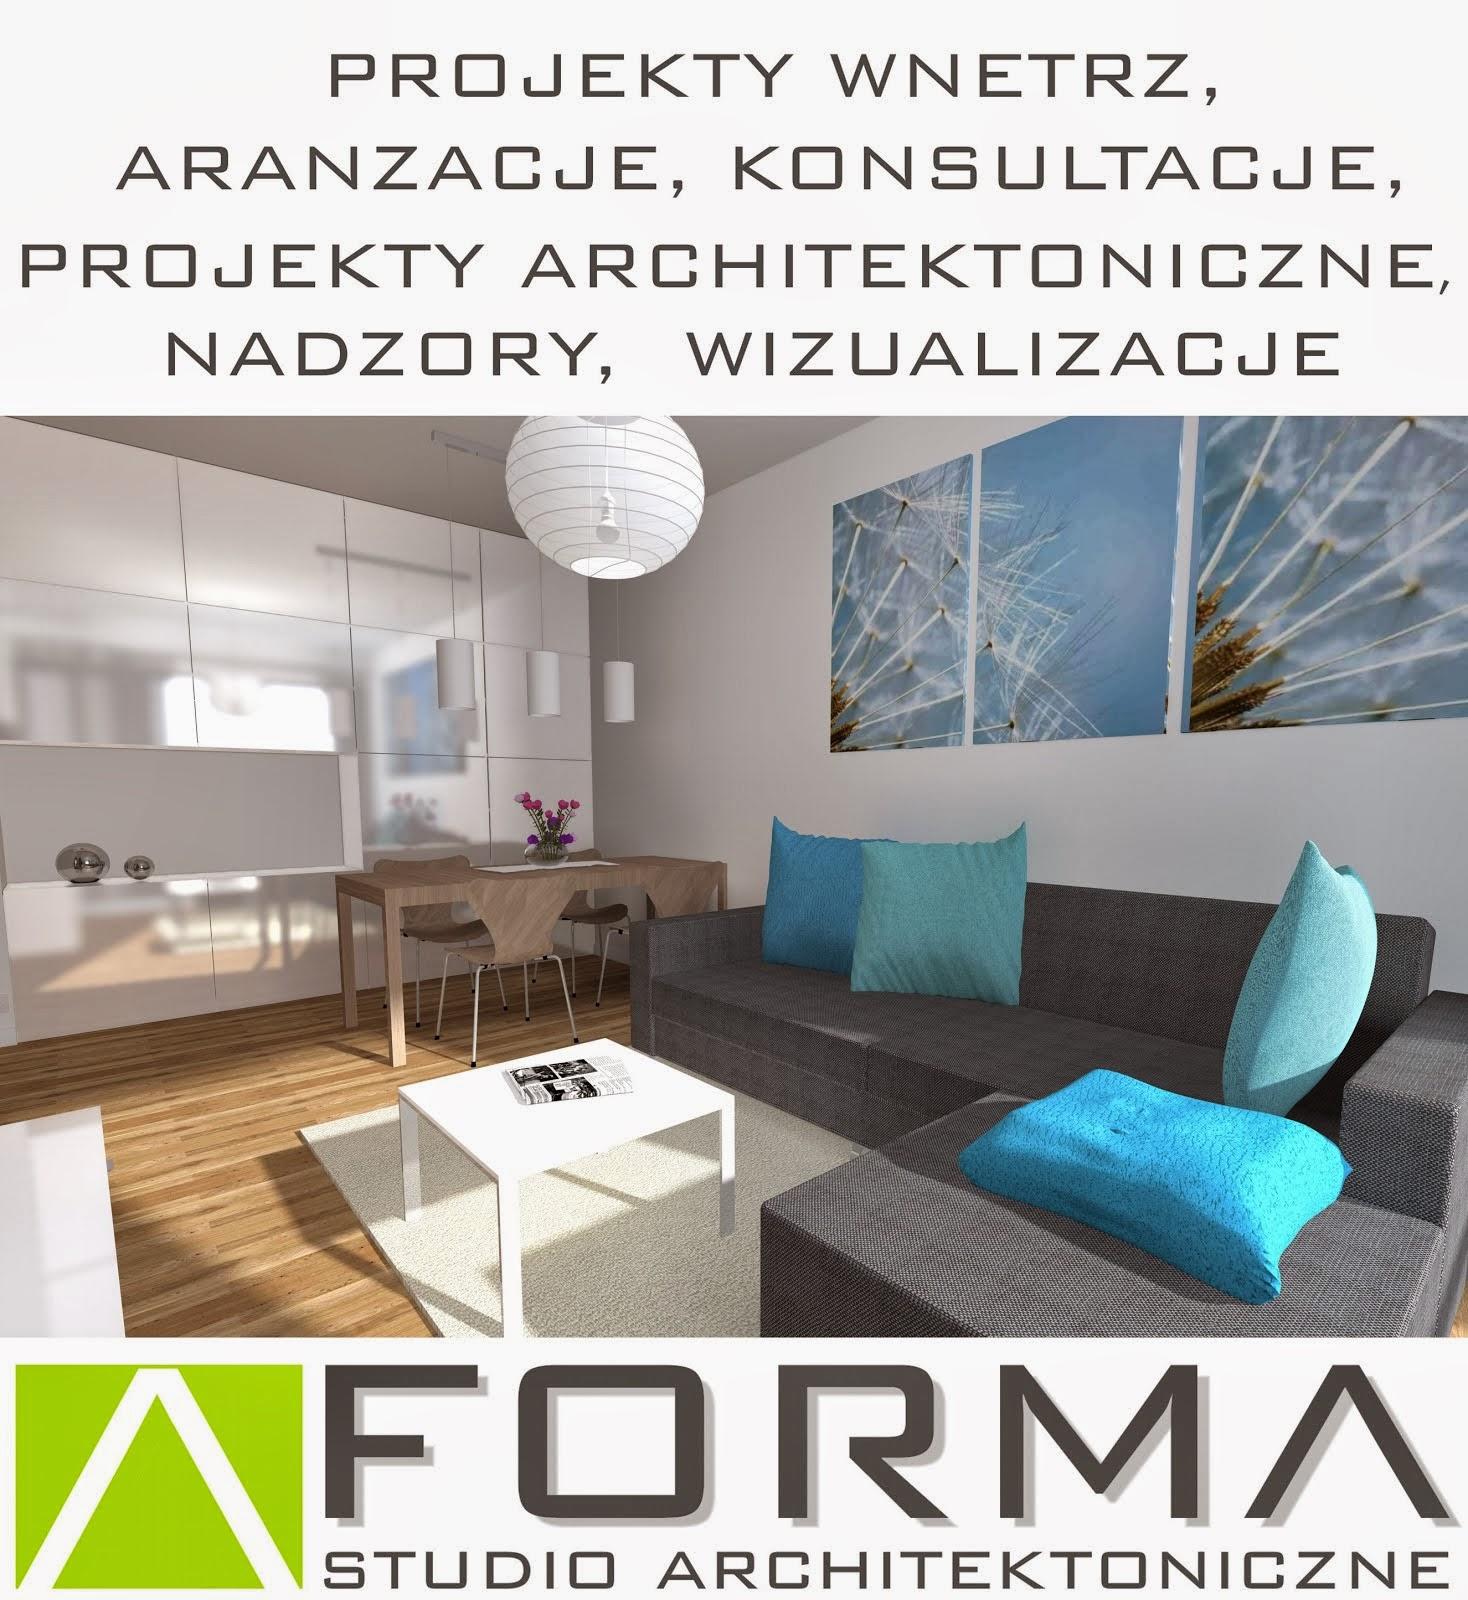 AFORMA Studio Architektoniczne